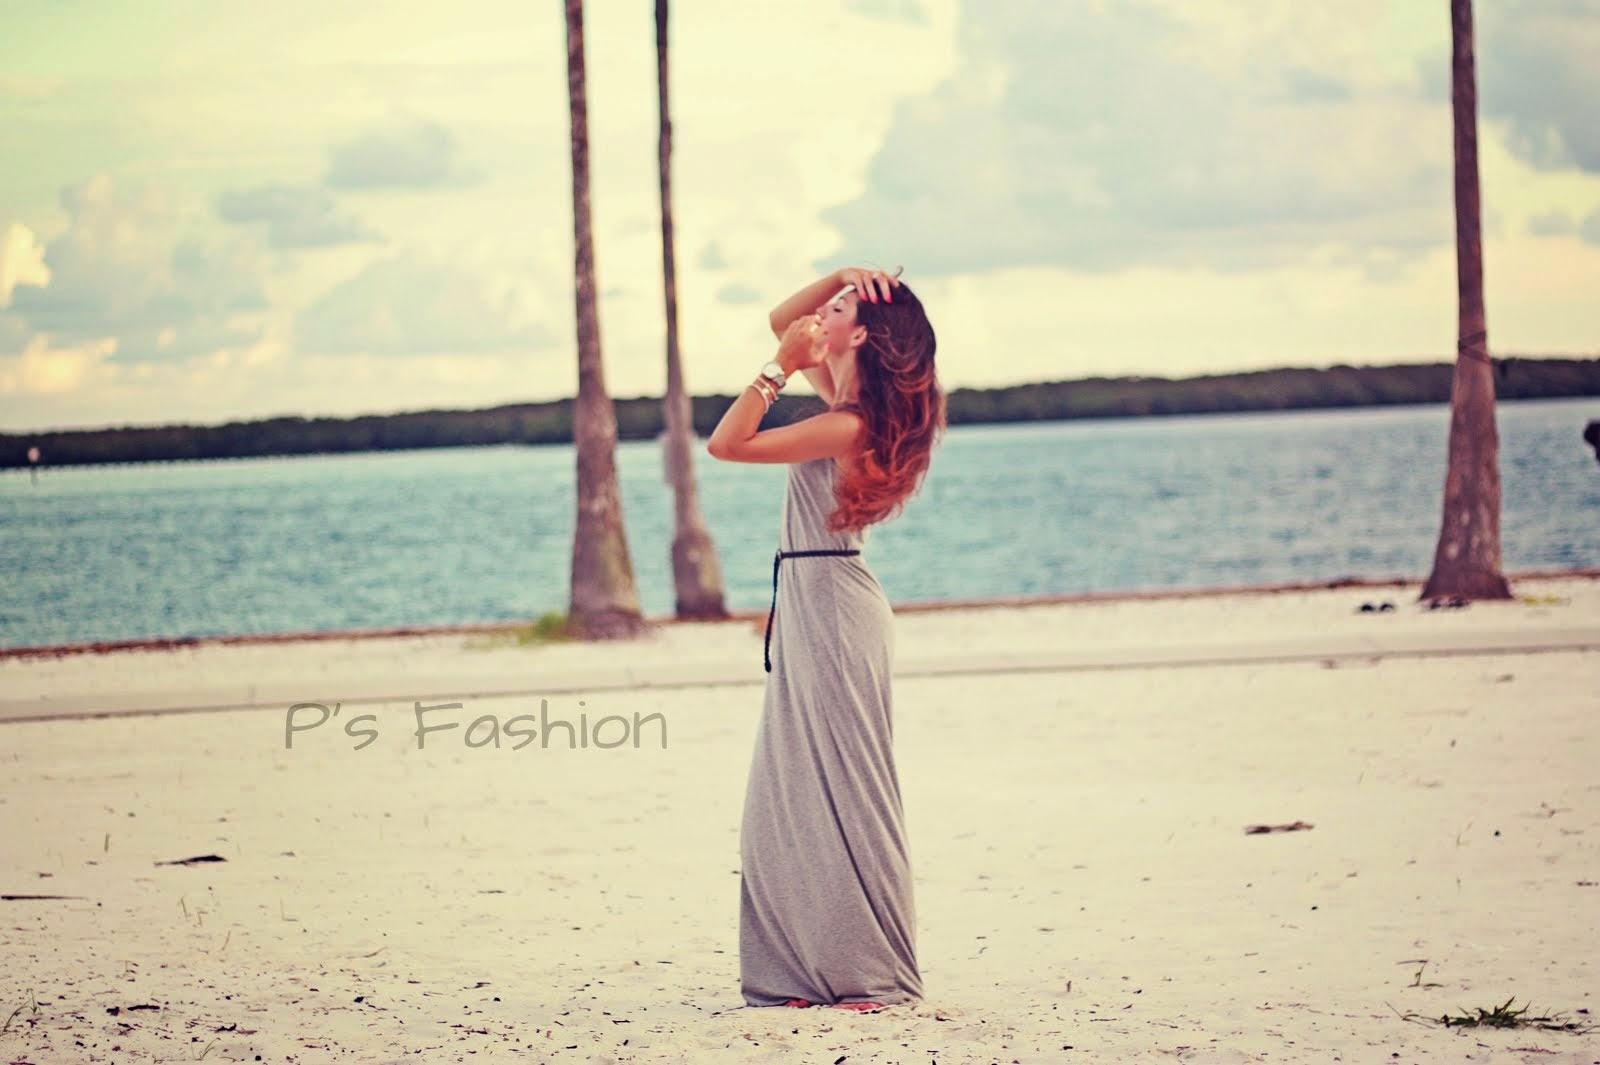 P's Fashion